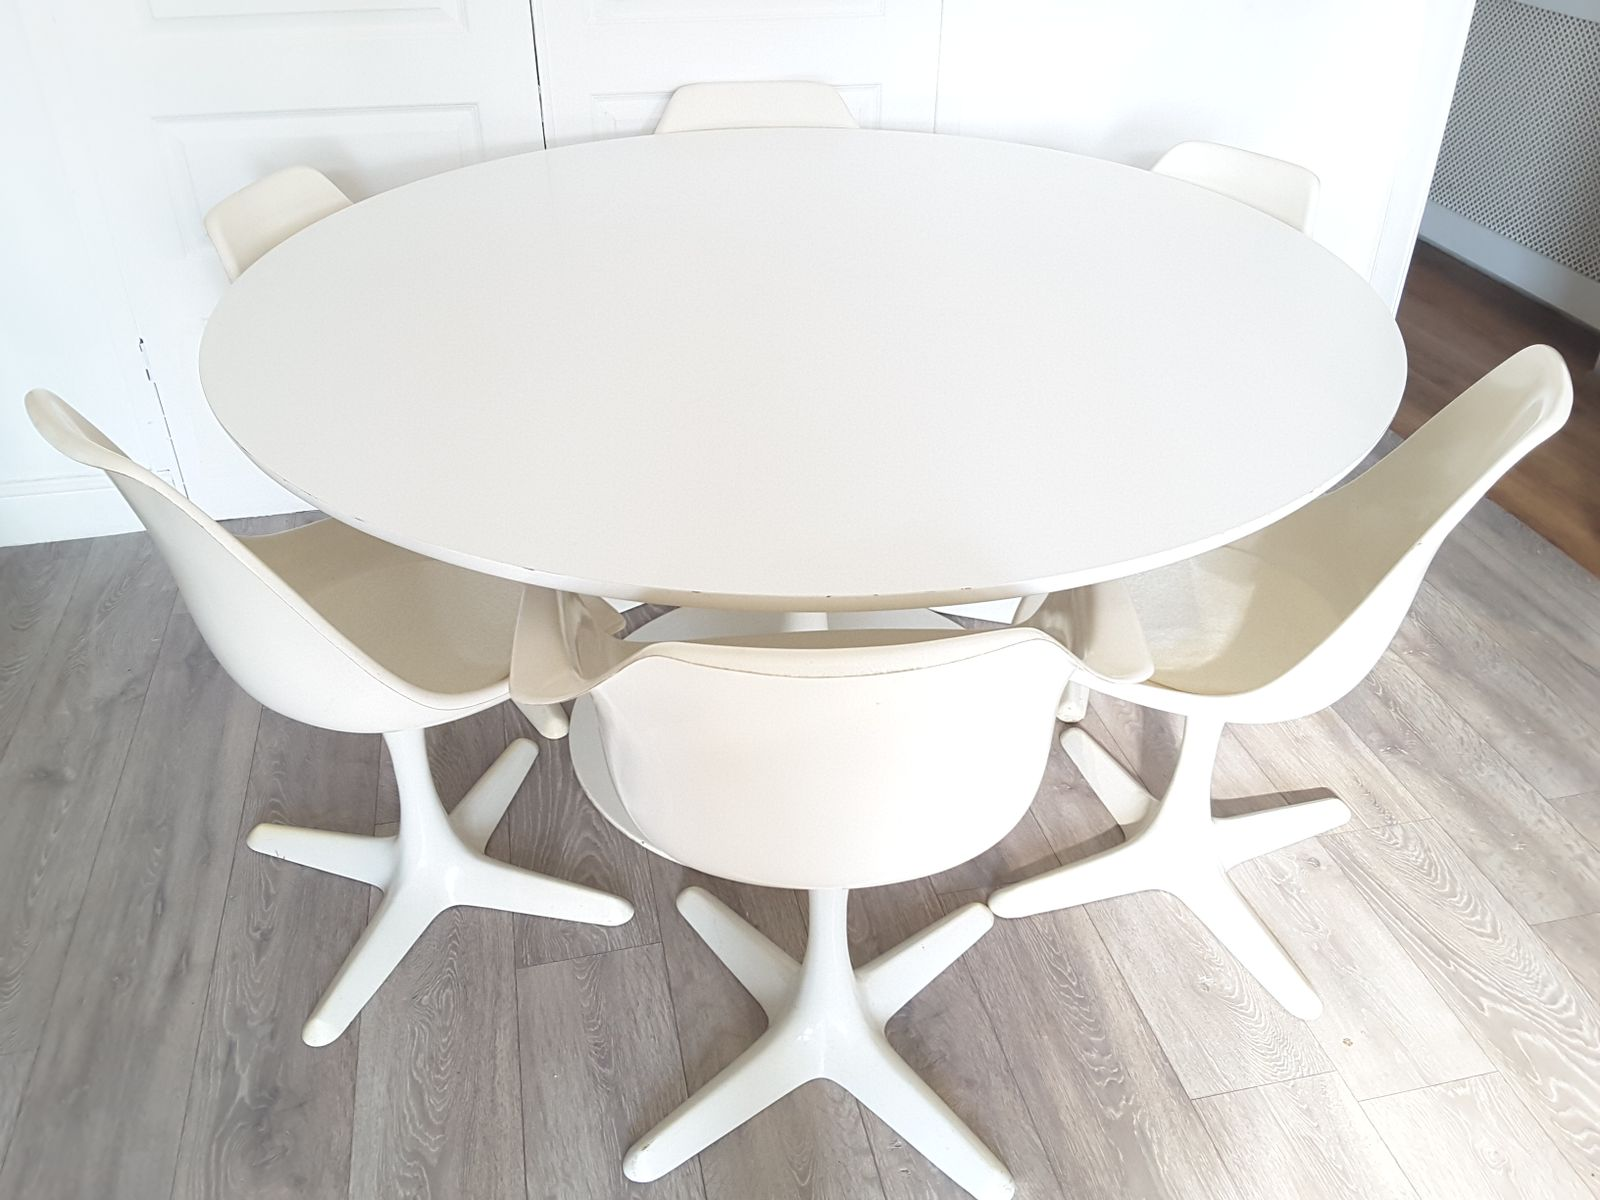 Grande table de salle manger ronde tulip et six chaises for Grande table ronde salle a manger